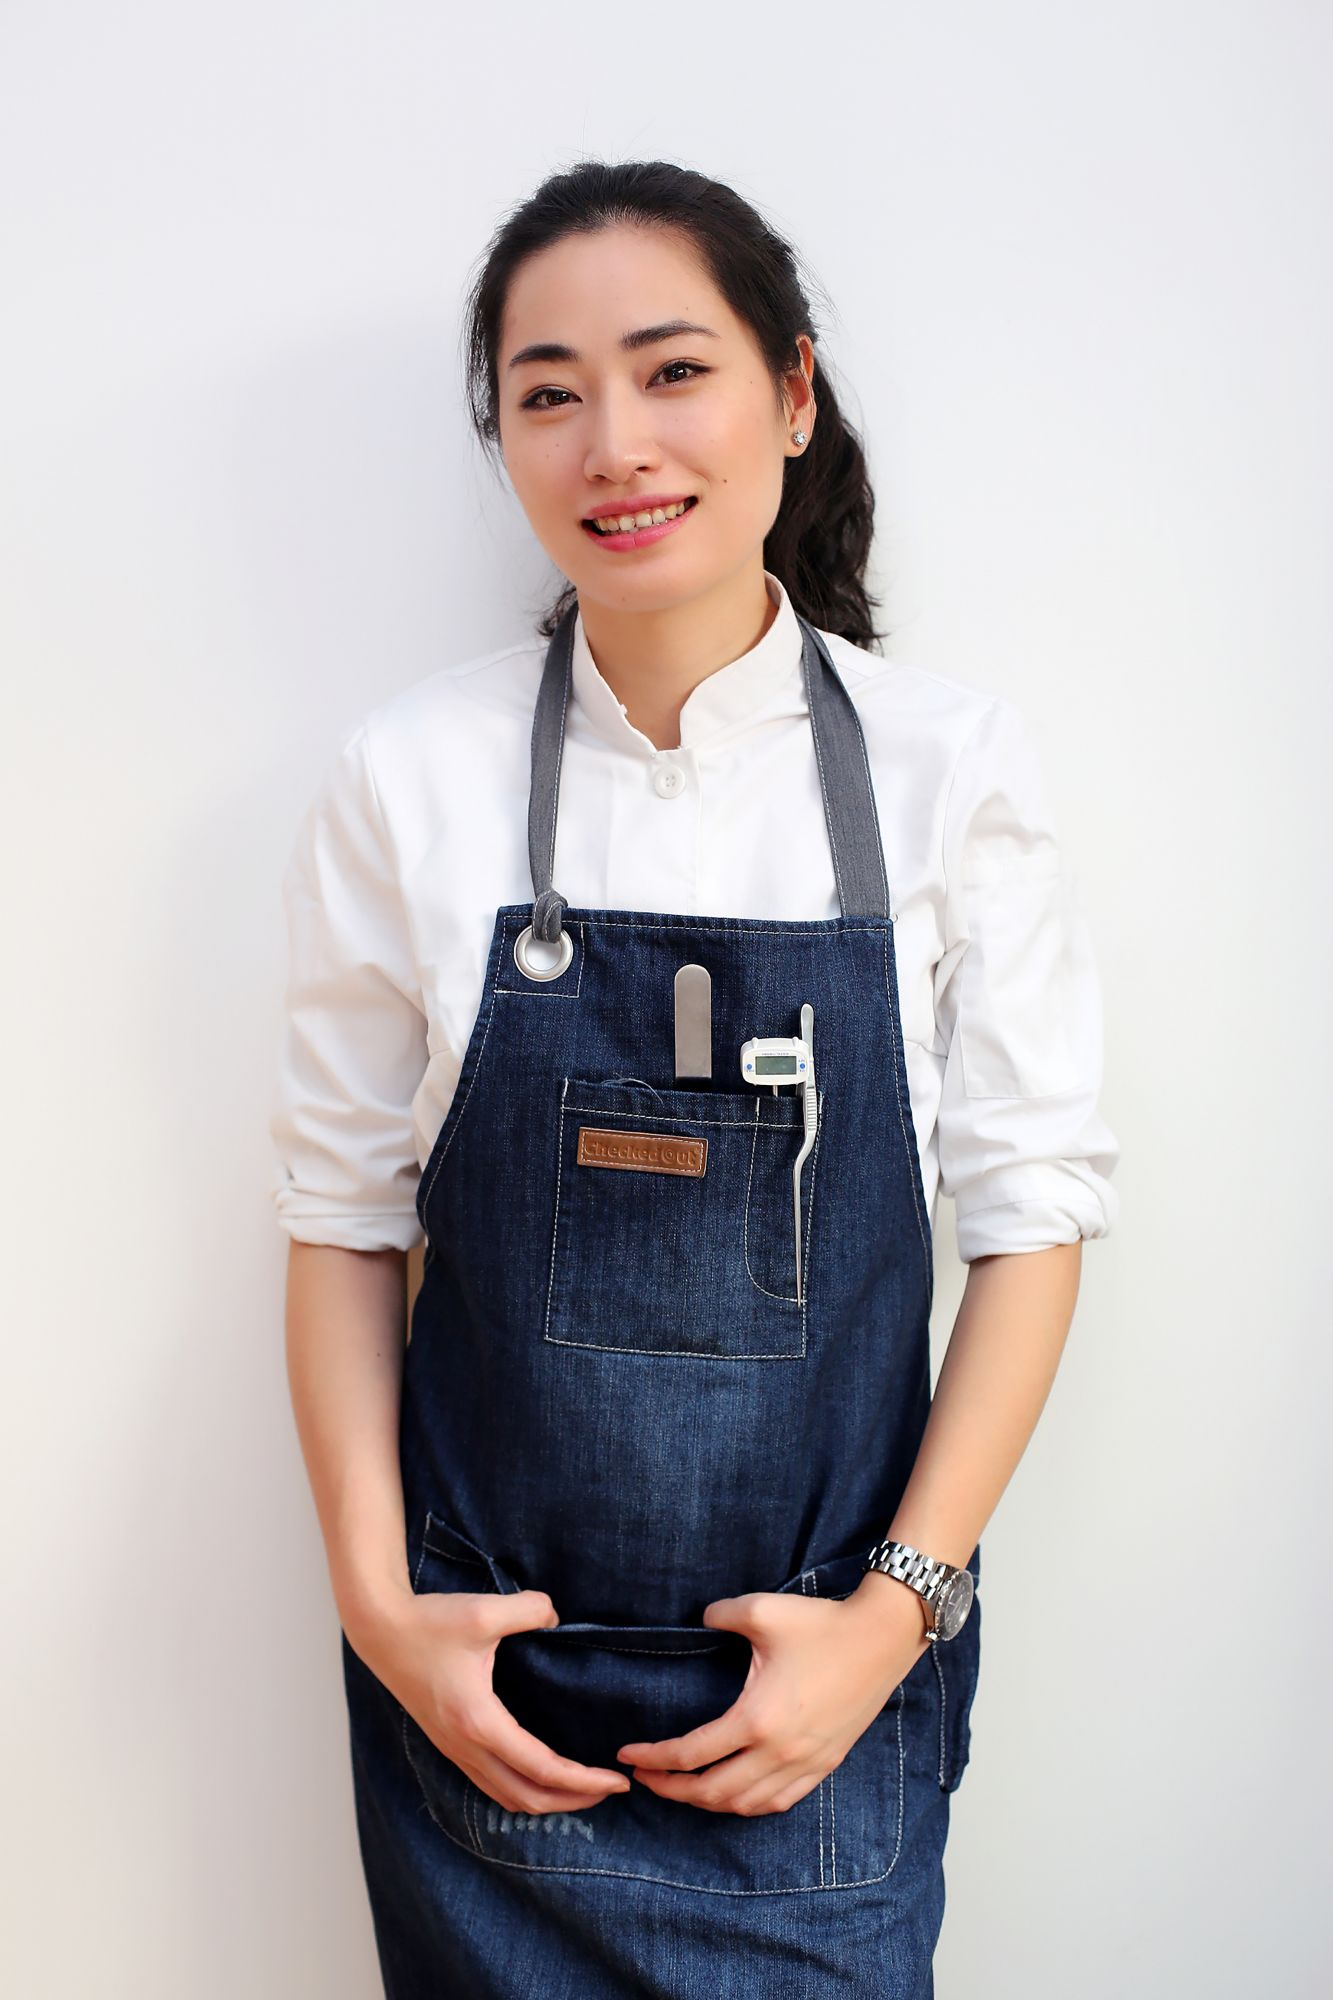 Gao Danyi